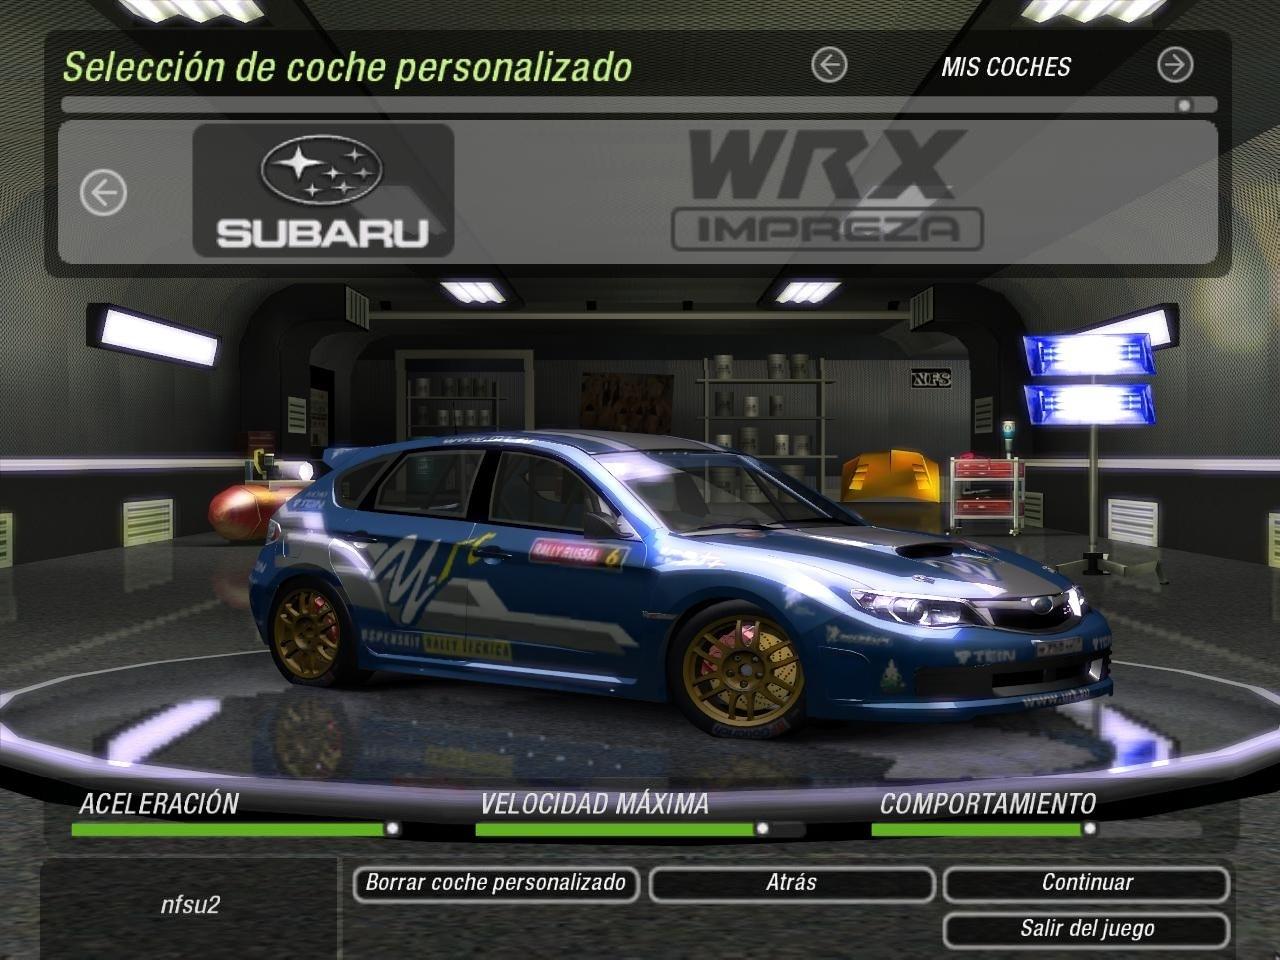 Need For Speed Underground 2 Subaru Impreza WRX N14 | NFSCars